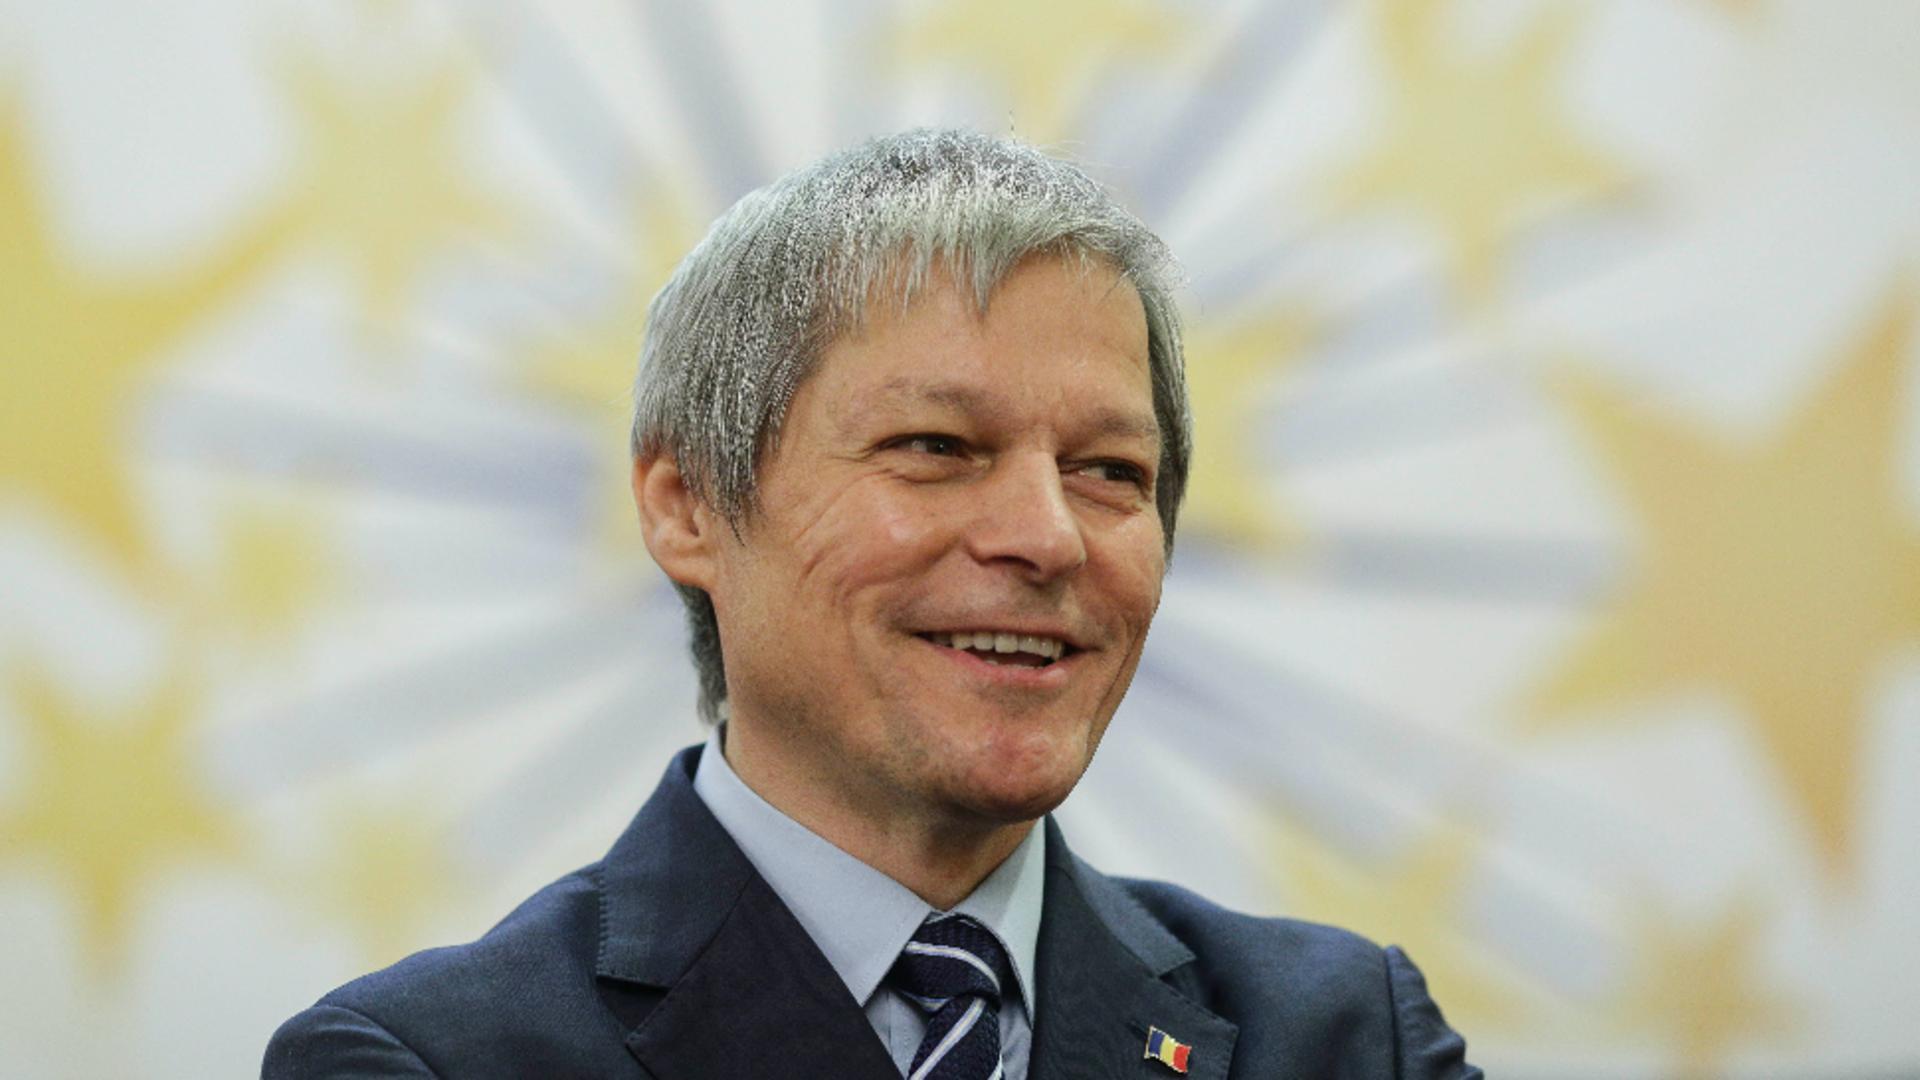 Dacian Cioloș Foto: INQUAM/Octav Ganea